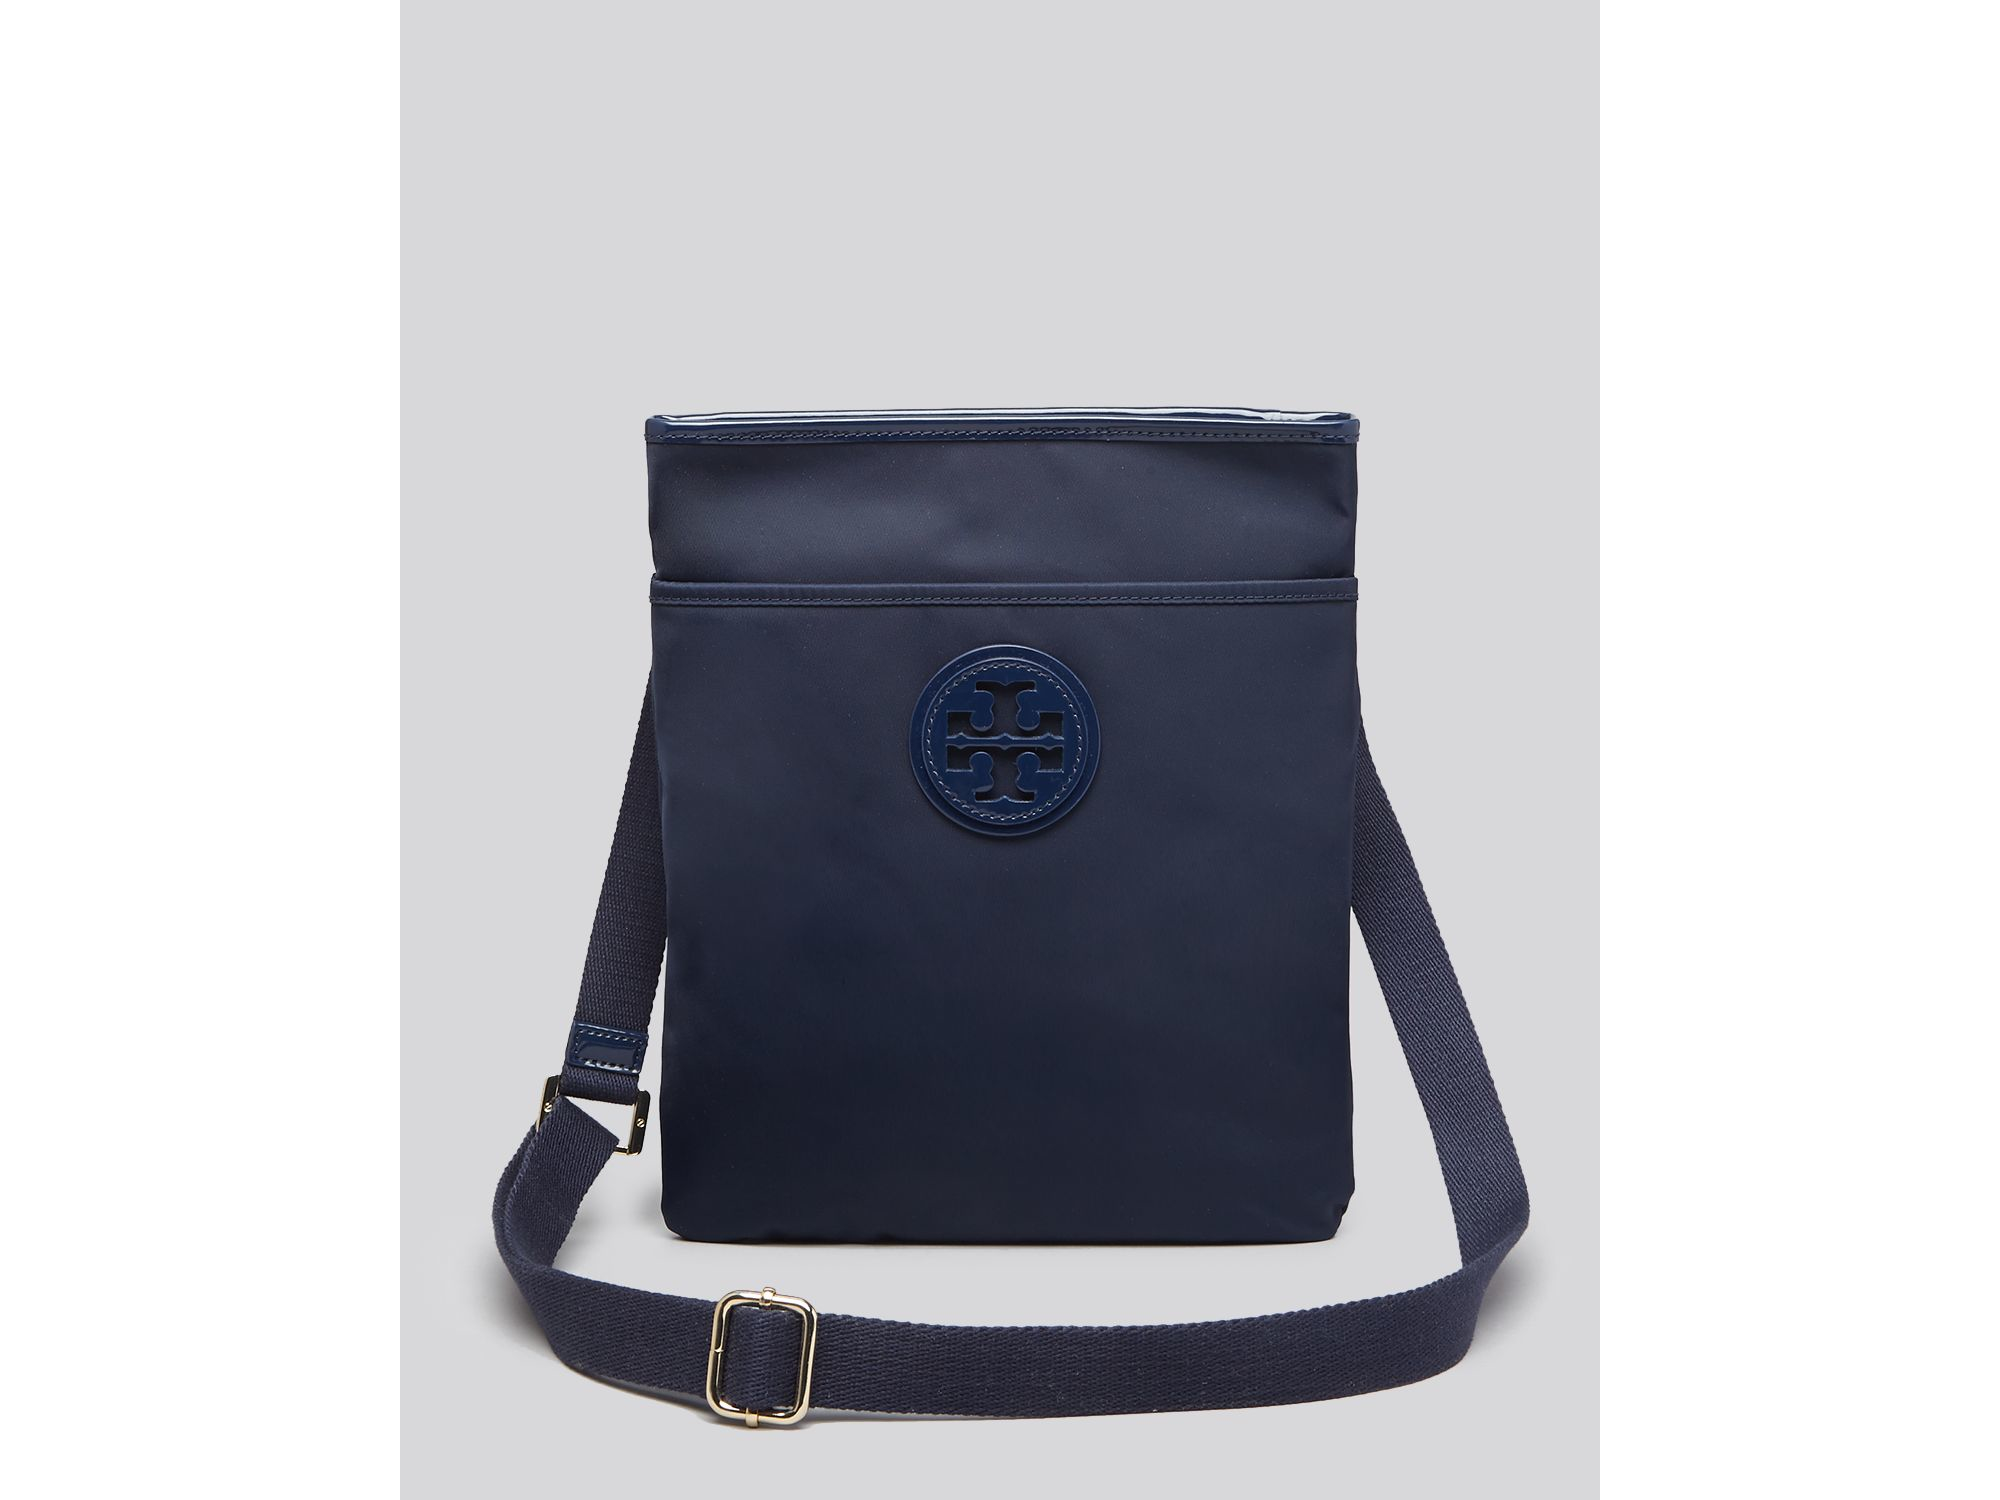 2edaab5844d4 Lyst Tory Burch Nylon Ella Swingpack Crossbody In Blue. Tory Burch Scout Nylon  Crossbody Bag Black